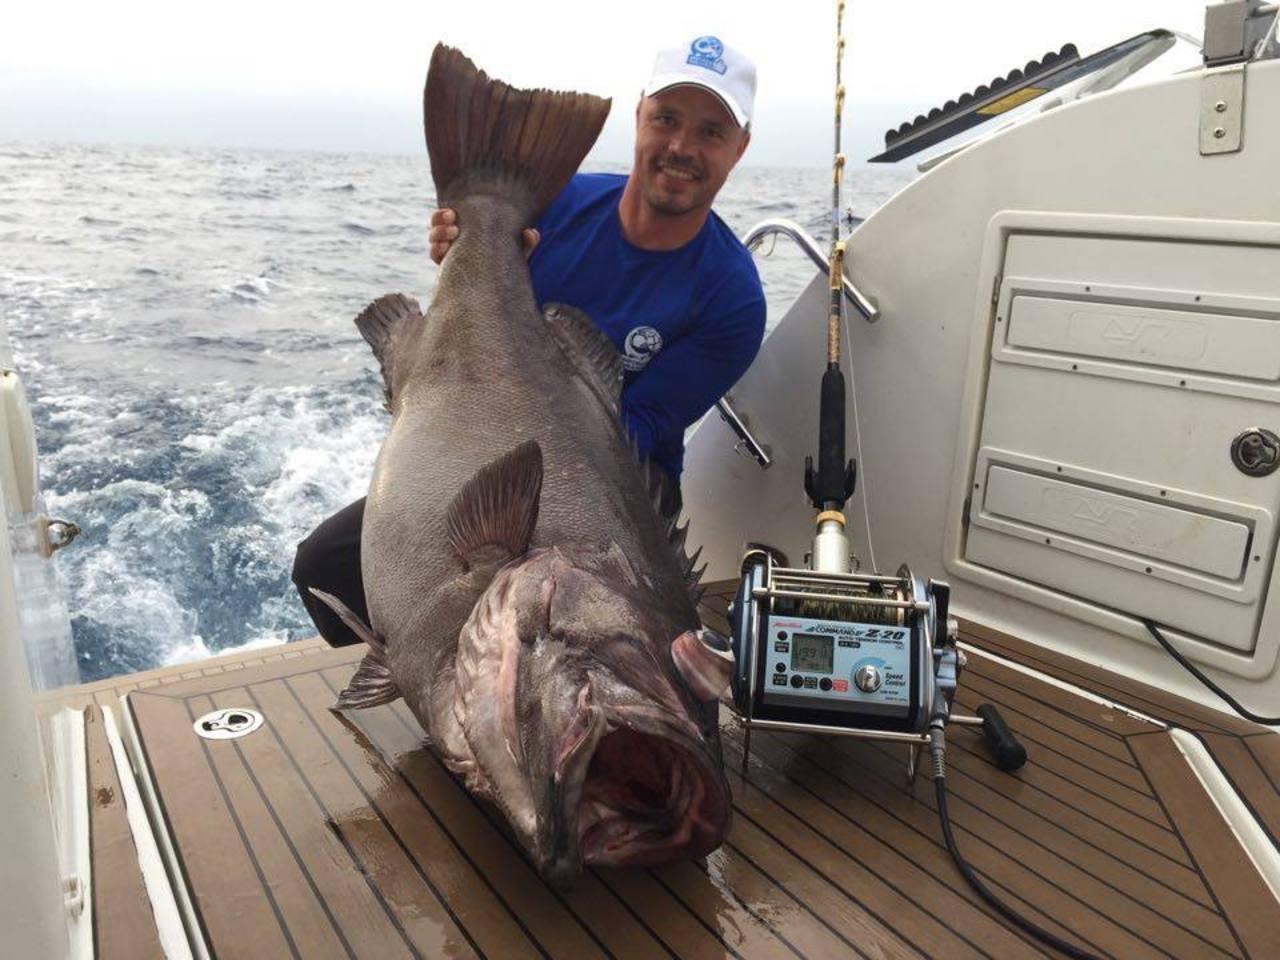 Professional fishing trip in Alanya photo 4843177